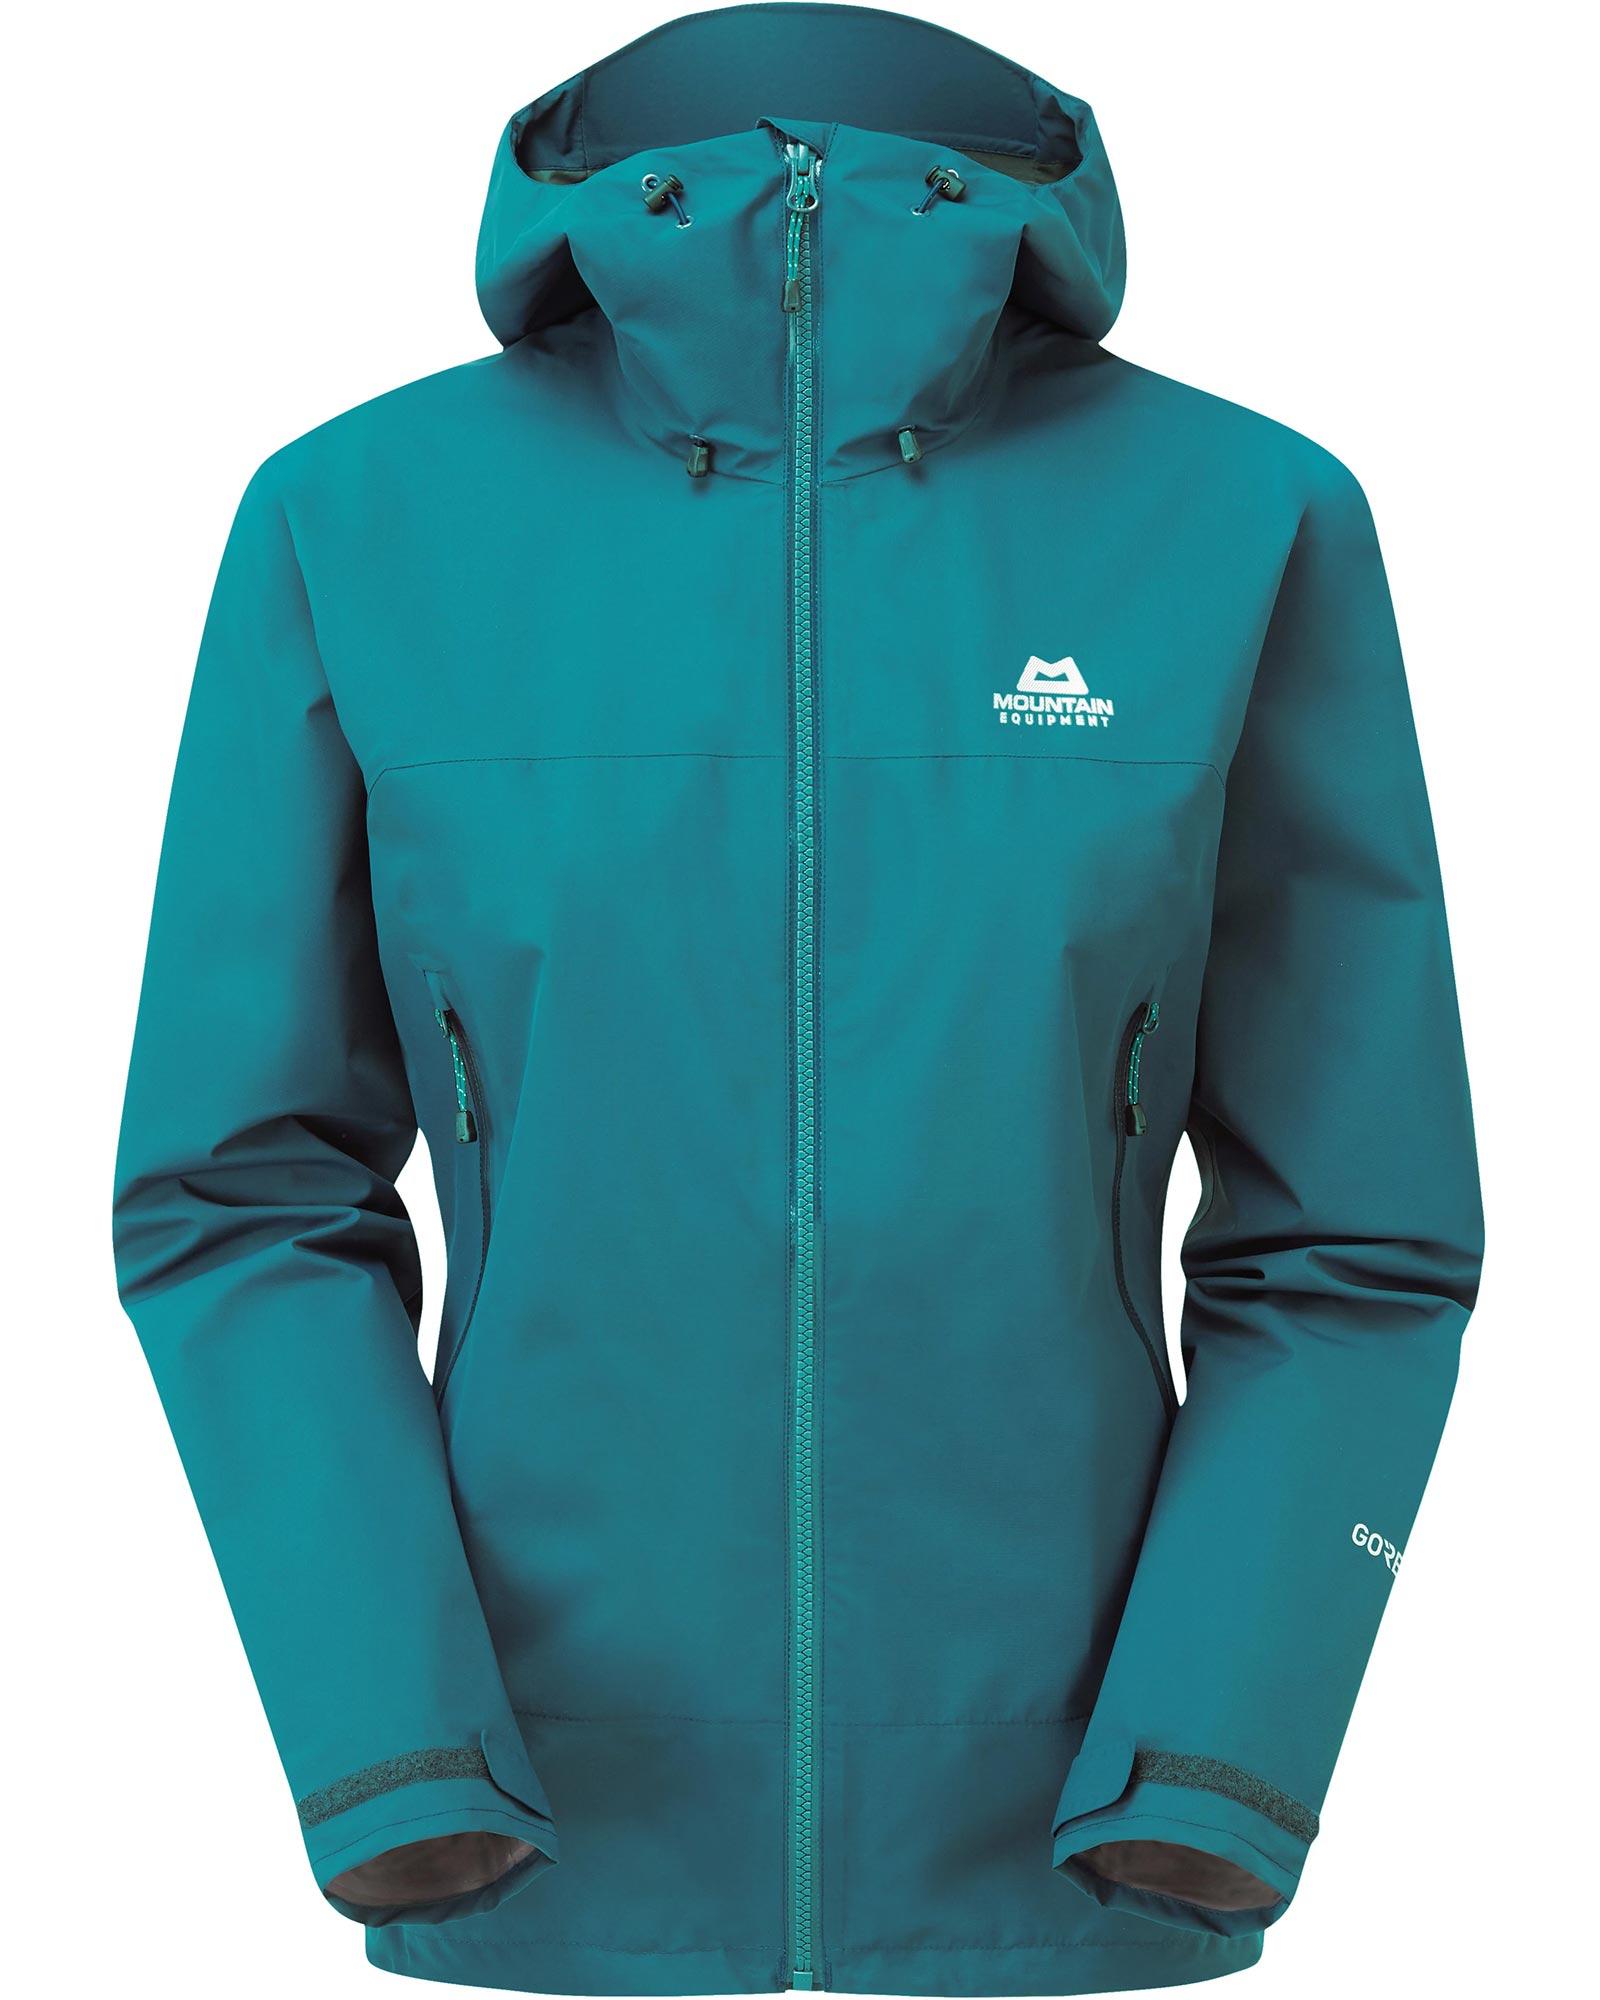 Mountain Equipment Moonflower GORE-TEX PACLITE Plus Women's Jacket 0